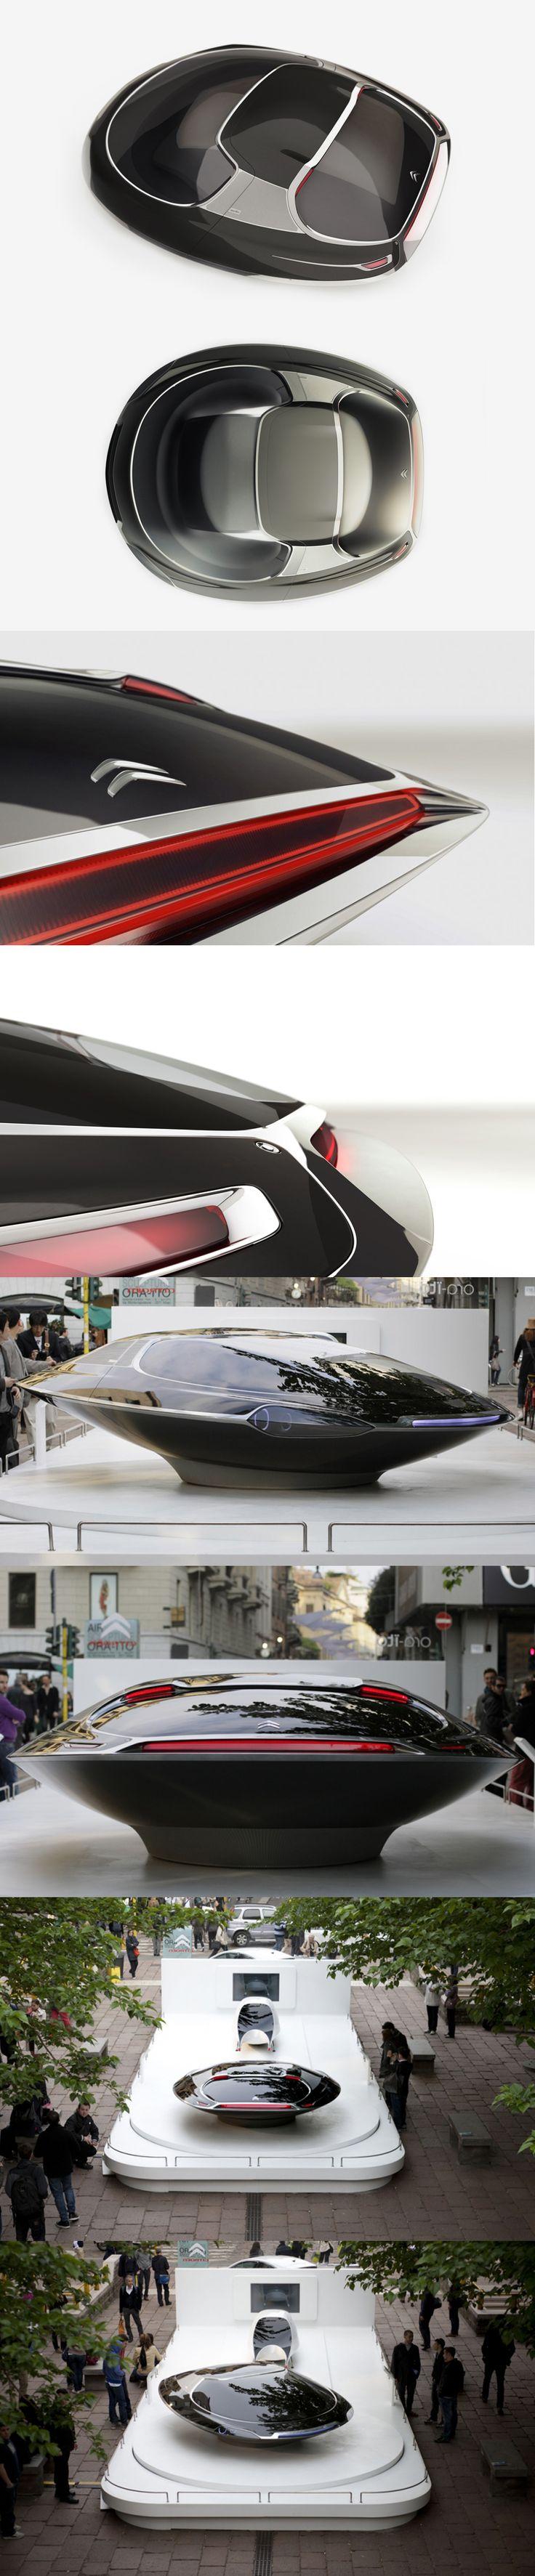 ♂ Futuristic transportation Citroen's UFO Concept Car